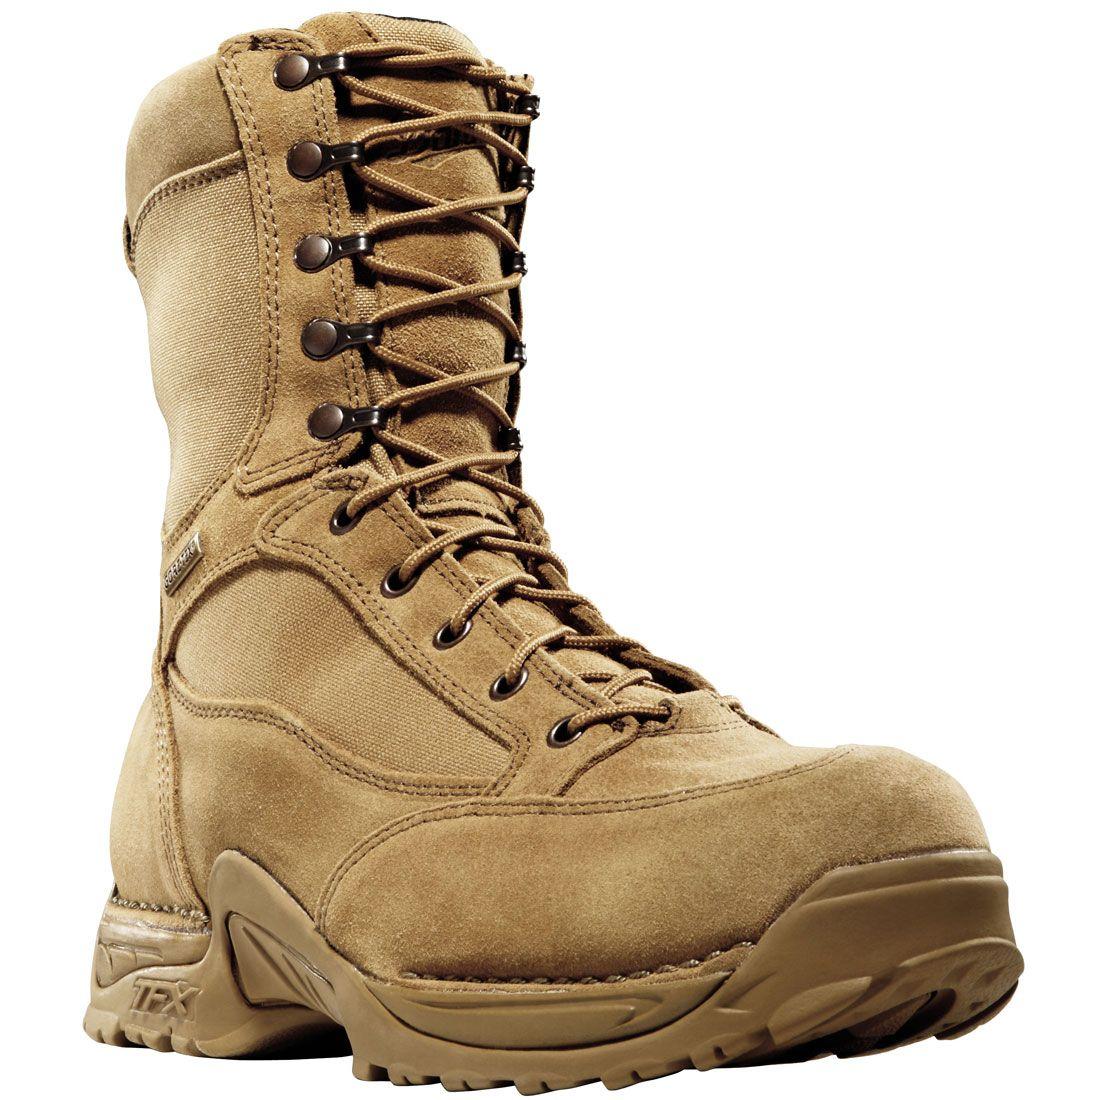 26010 Danner Men's Desert Eagle GTX Combat Boots - Mojave | Boots ...